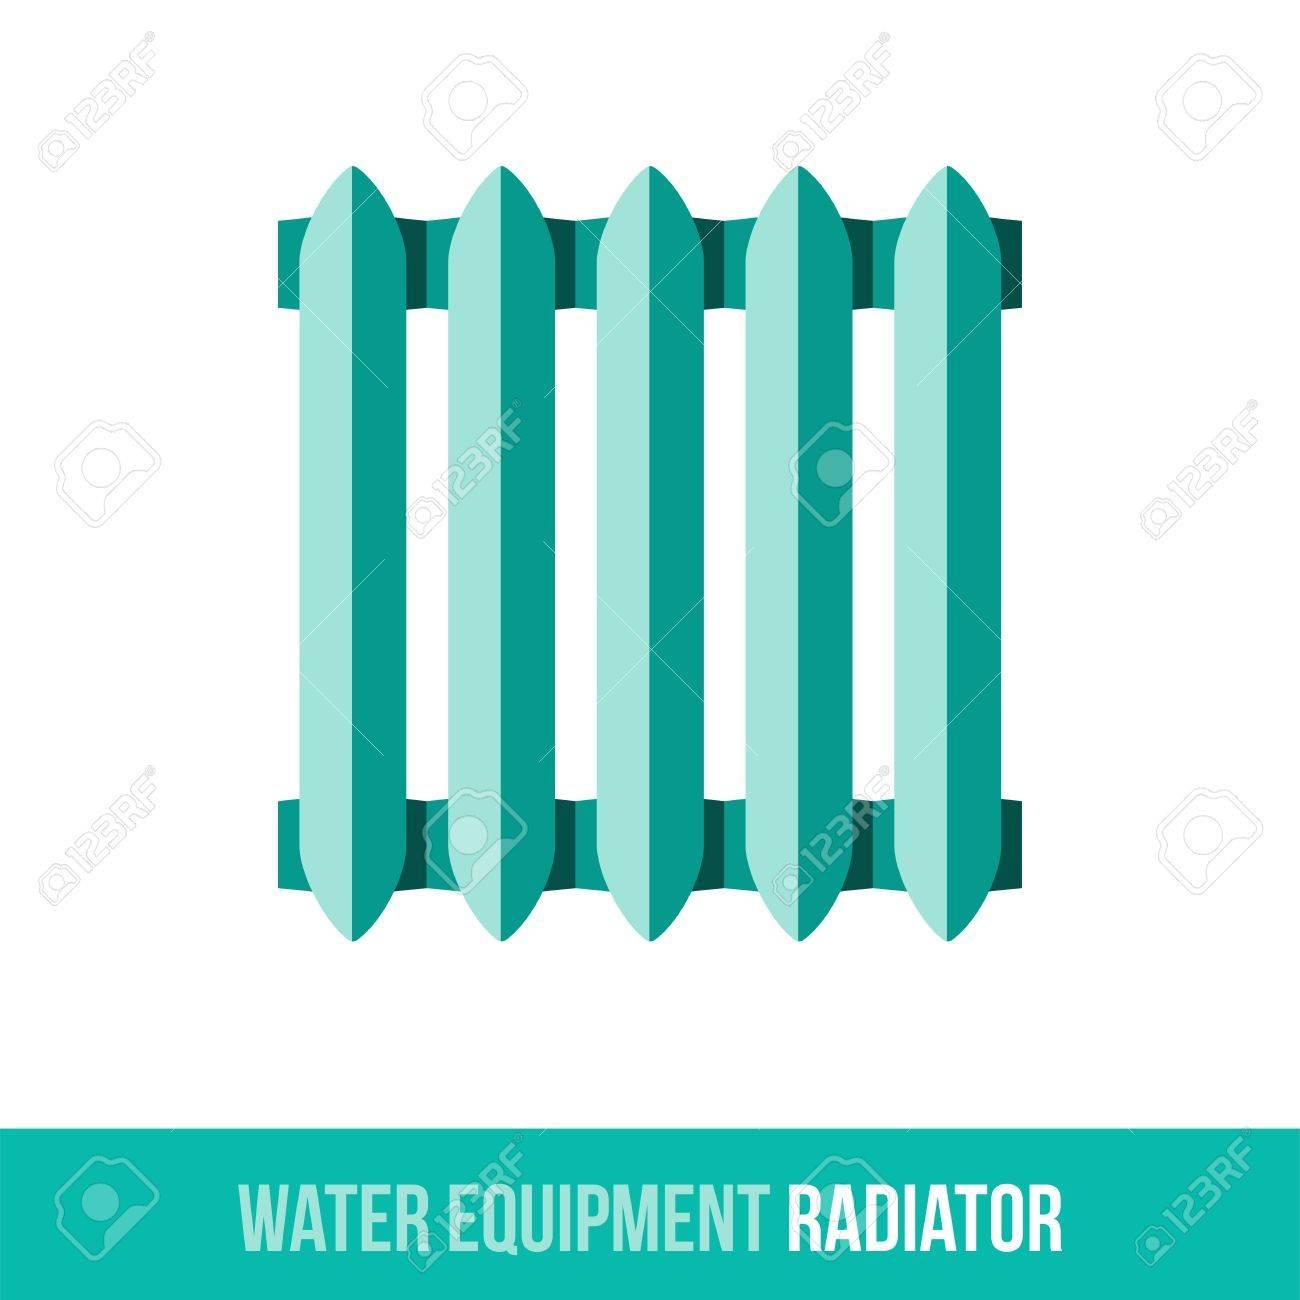 Vector - Vector flat icon central heating radiator. Web design, booklets,  brochures, advertisements, manuals, technical descriptions.